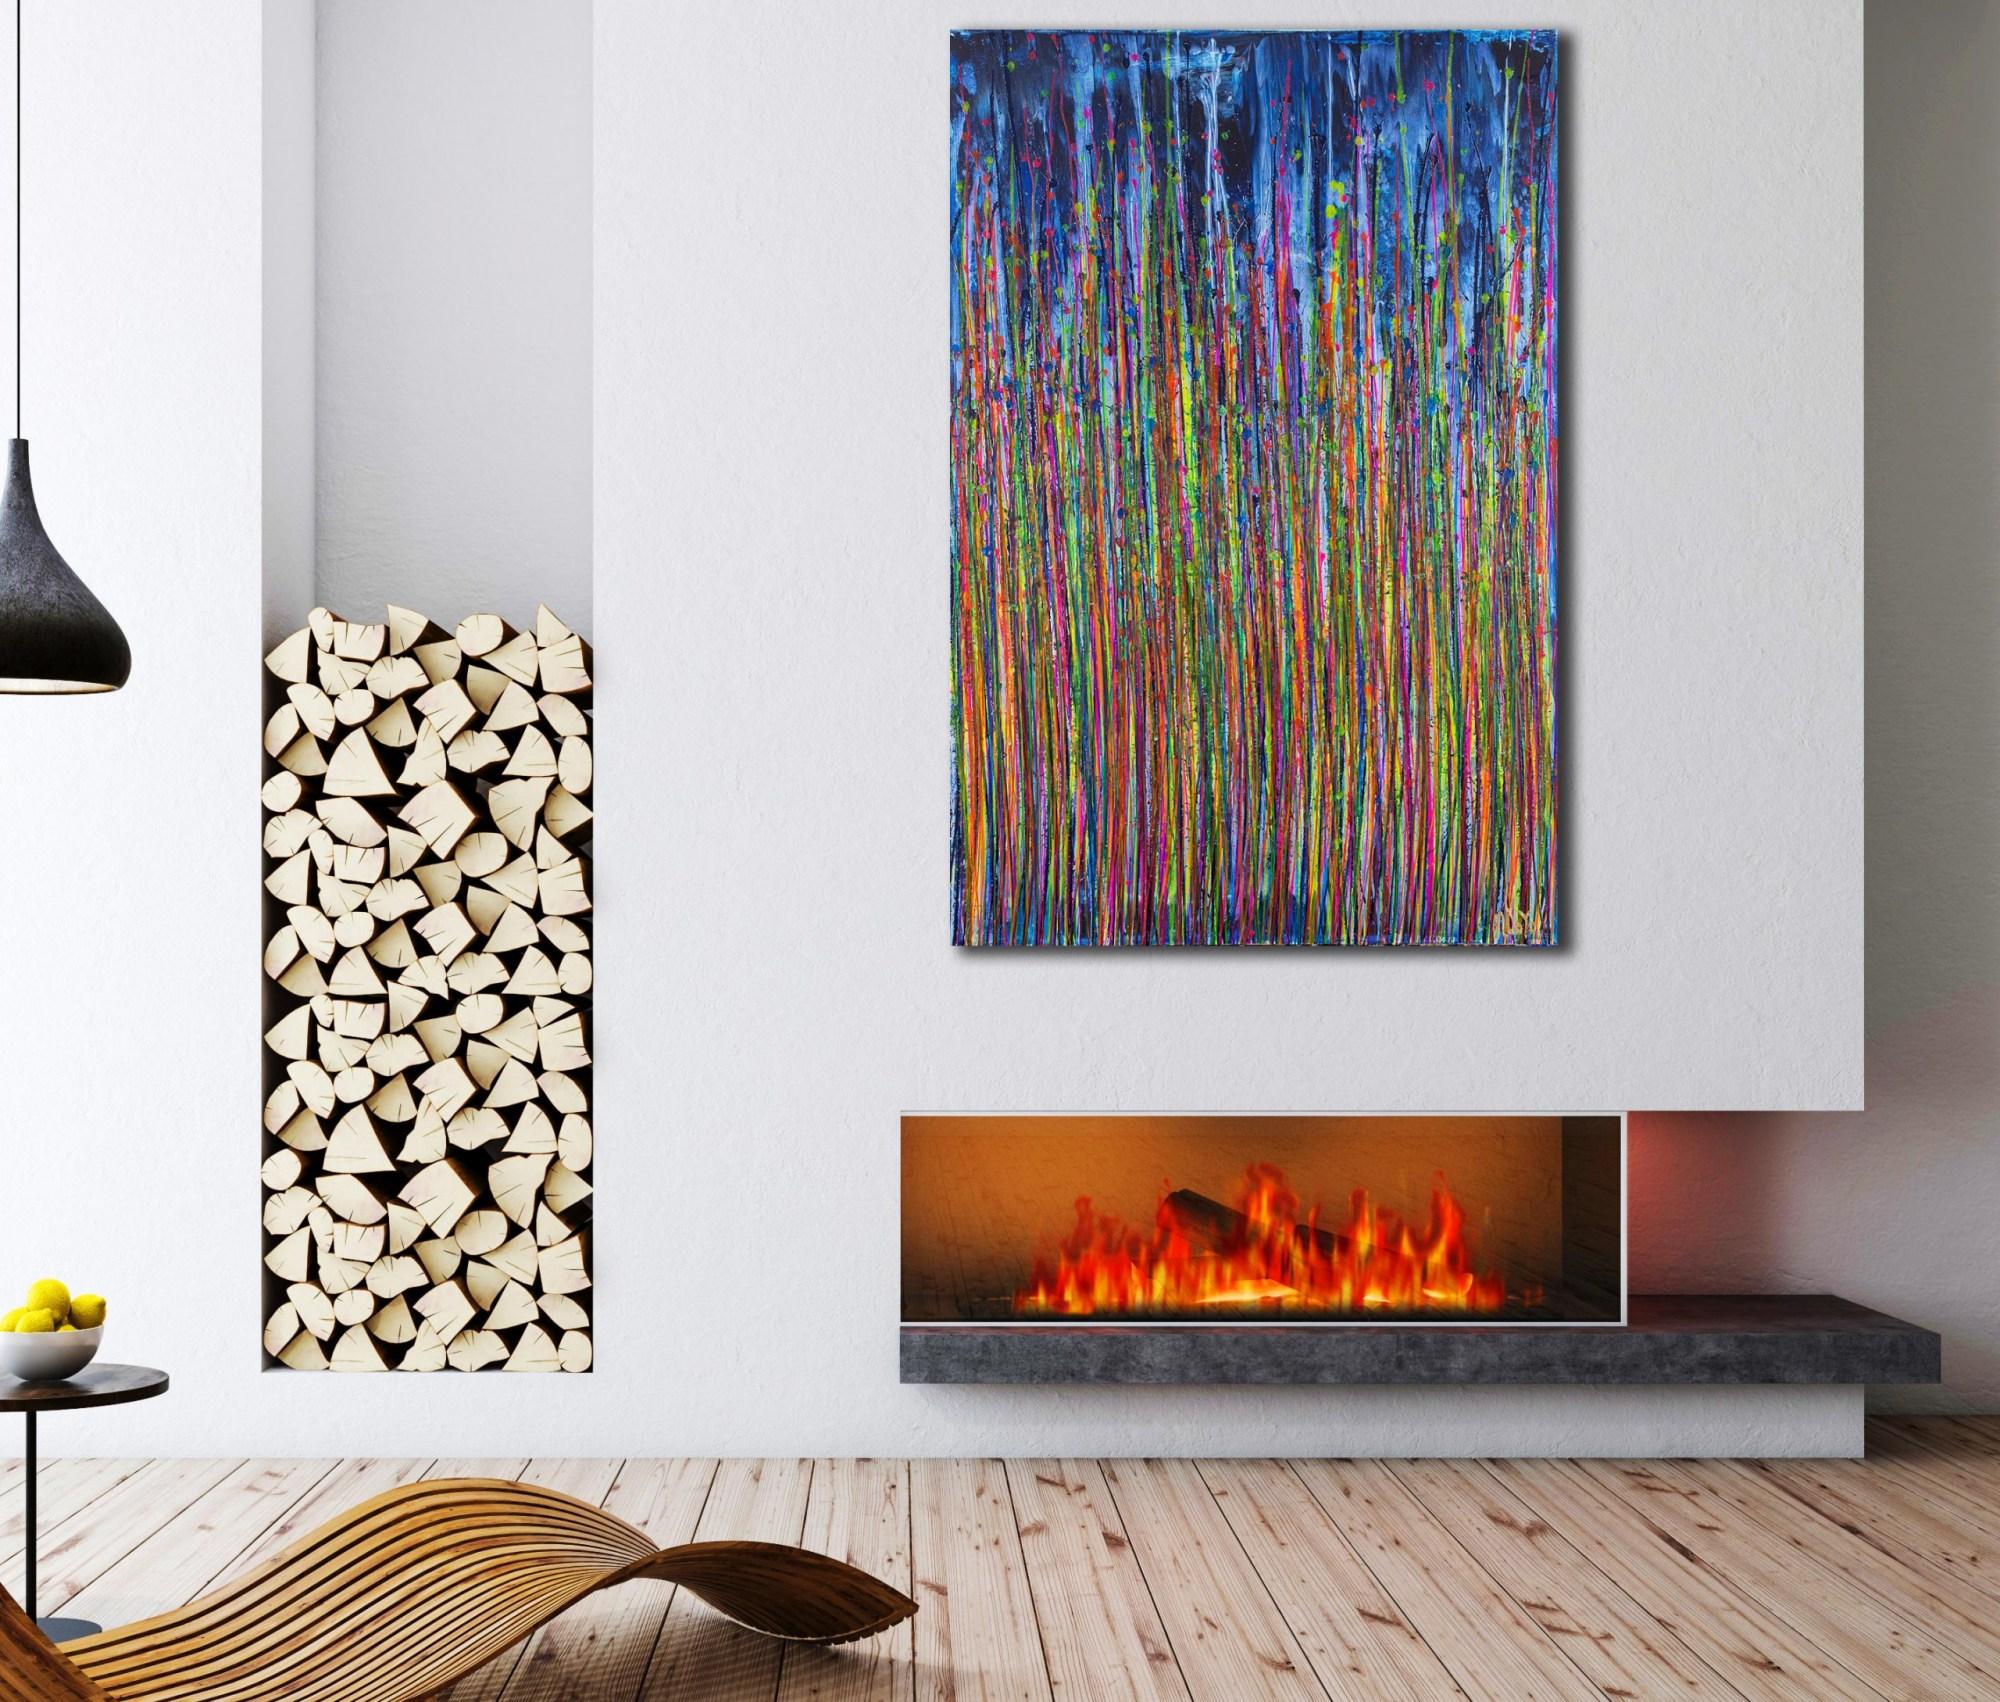 Room example / High Frequency Garden 1 (2021) / Artist: Nestor Toro